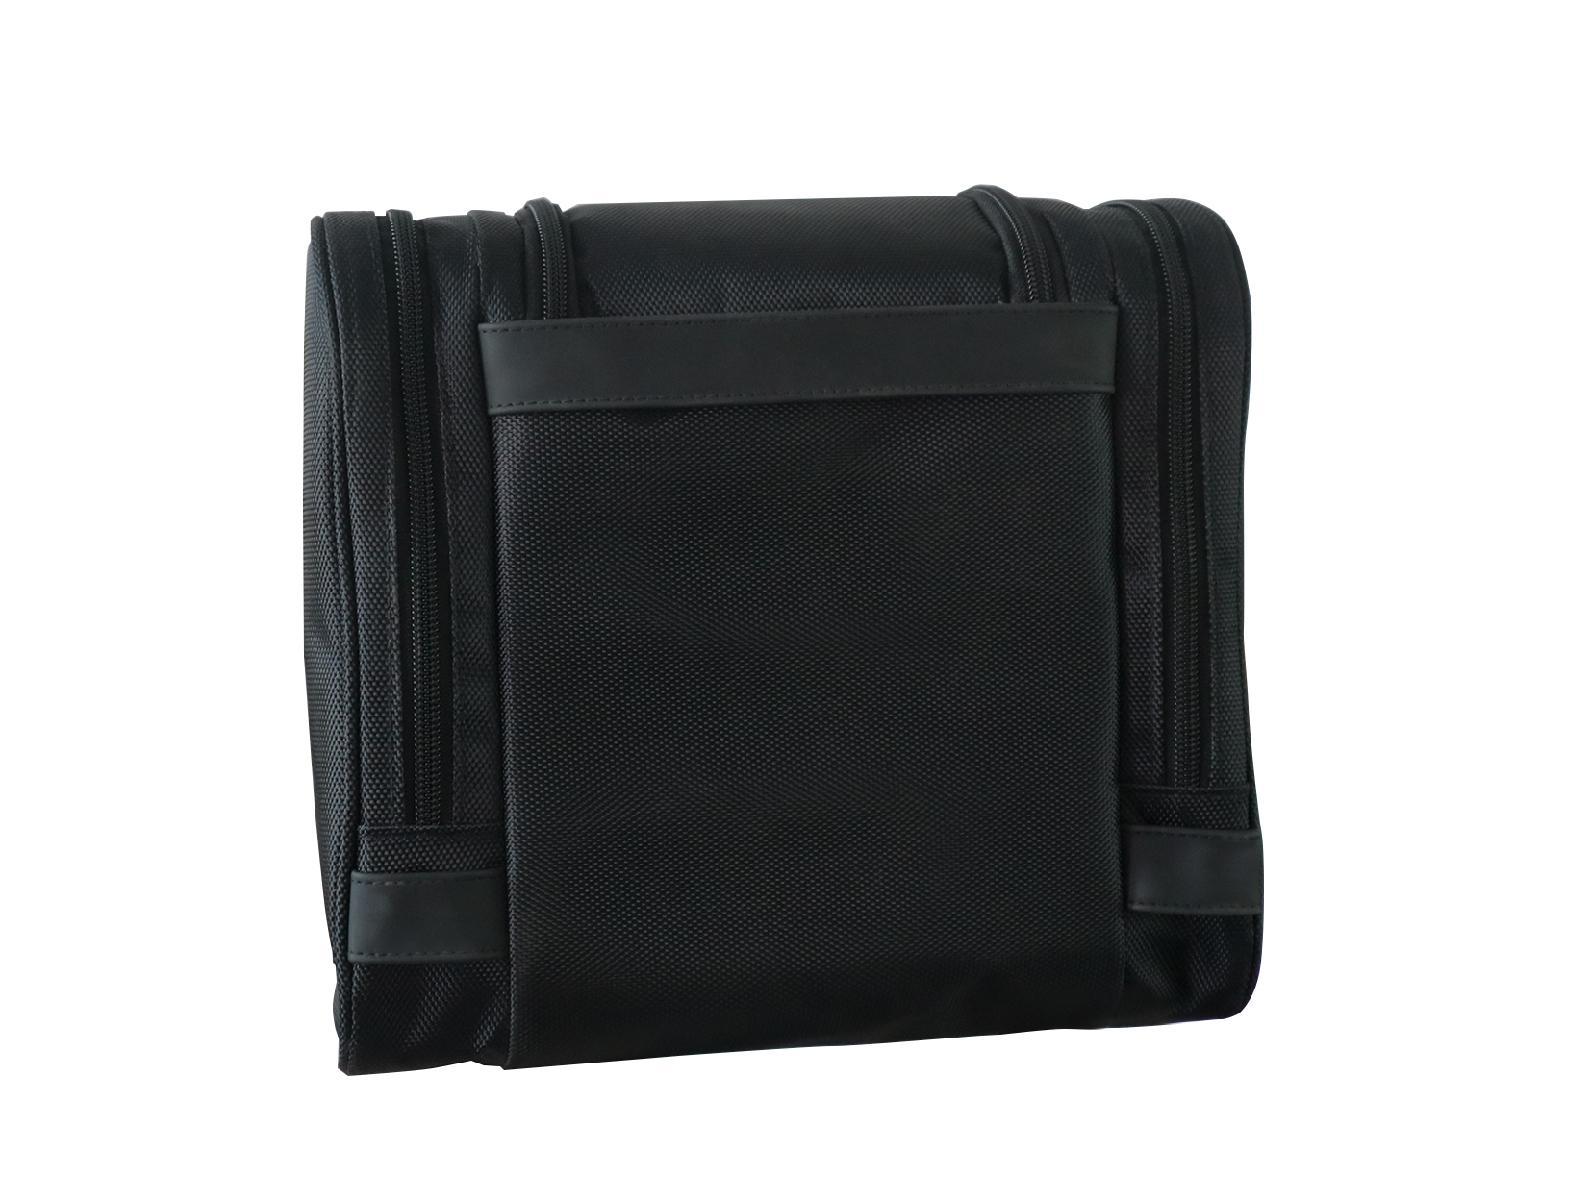 1680D polyester black multifunction men high grade travel hanging toiletry bag  4